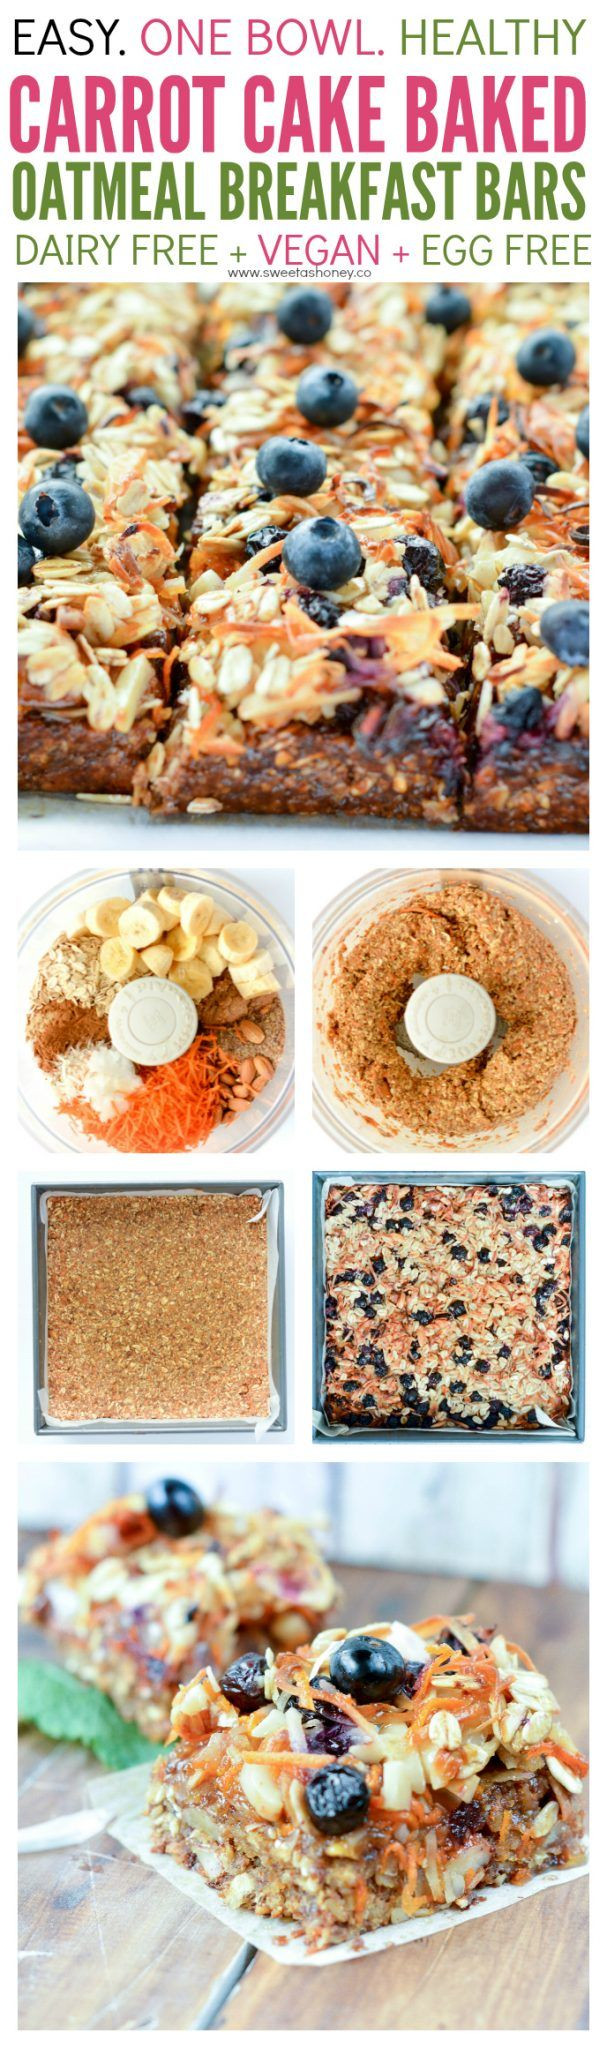 Healthy Oatmeal Breakfast Bars Recipe Easy  Carrot Cake Oatmeal Breakfast Bars are super easy and